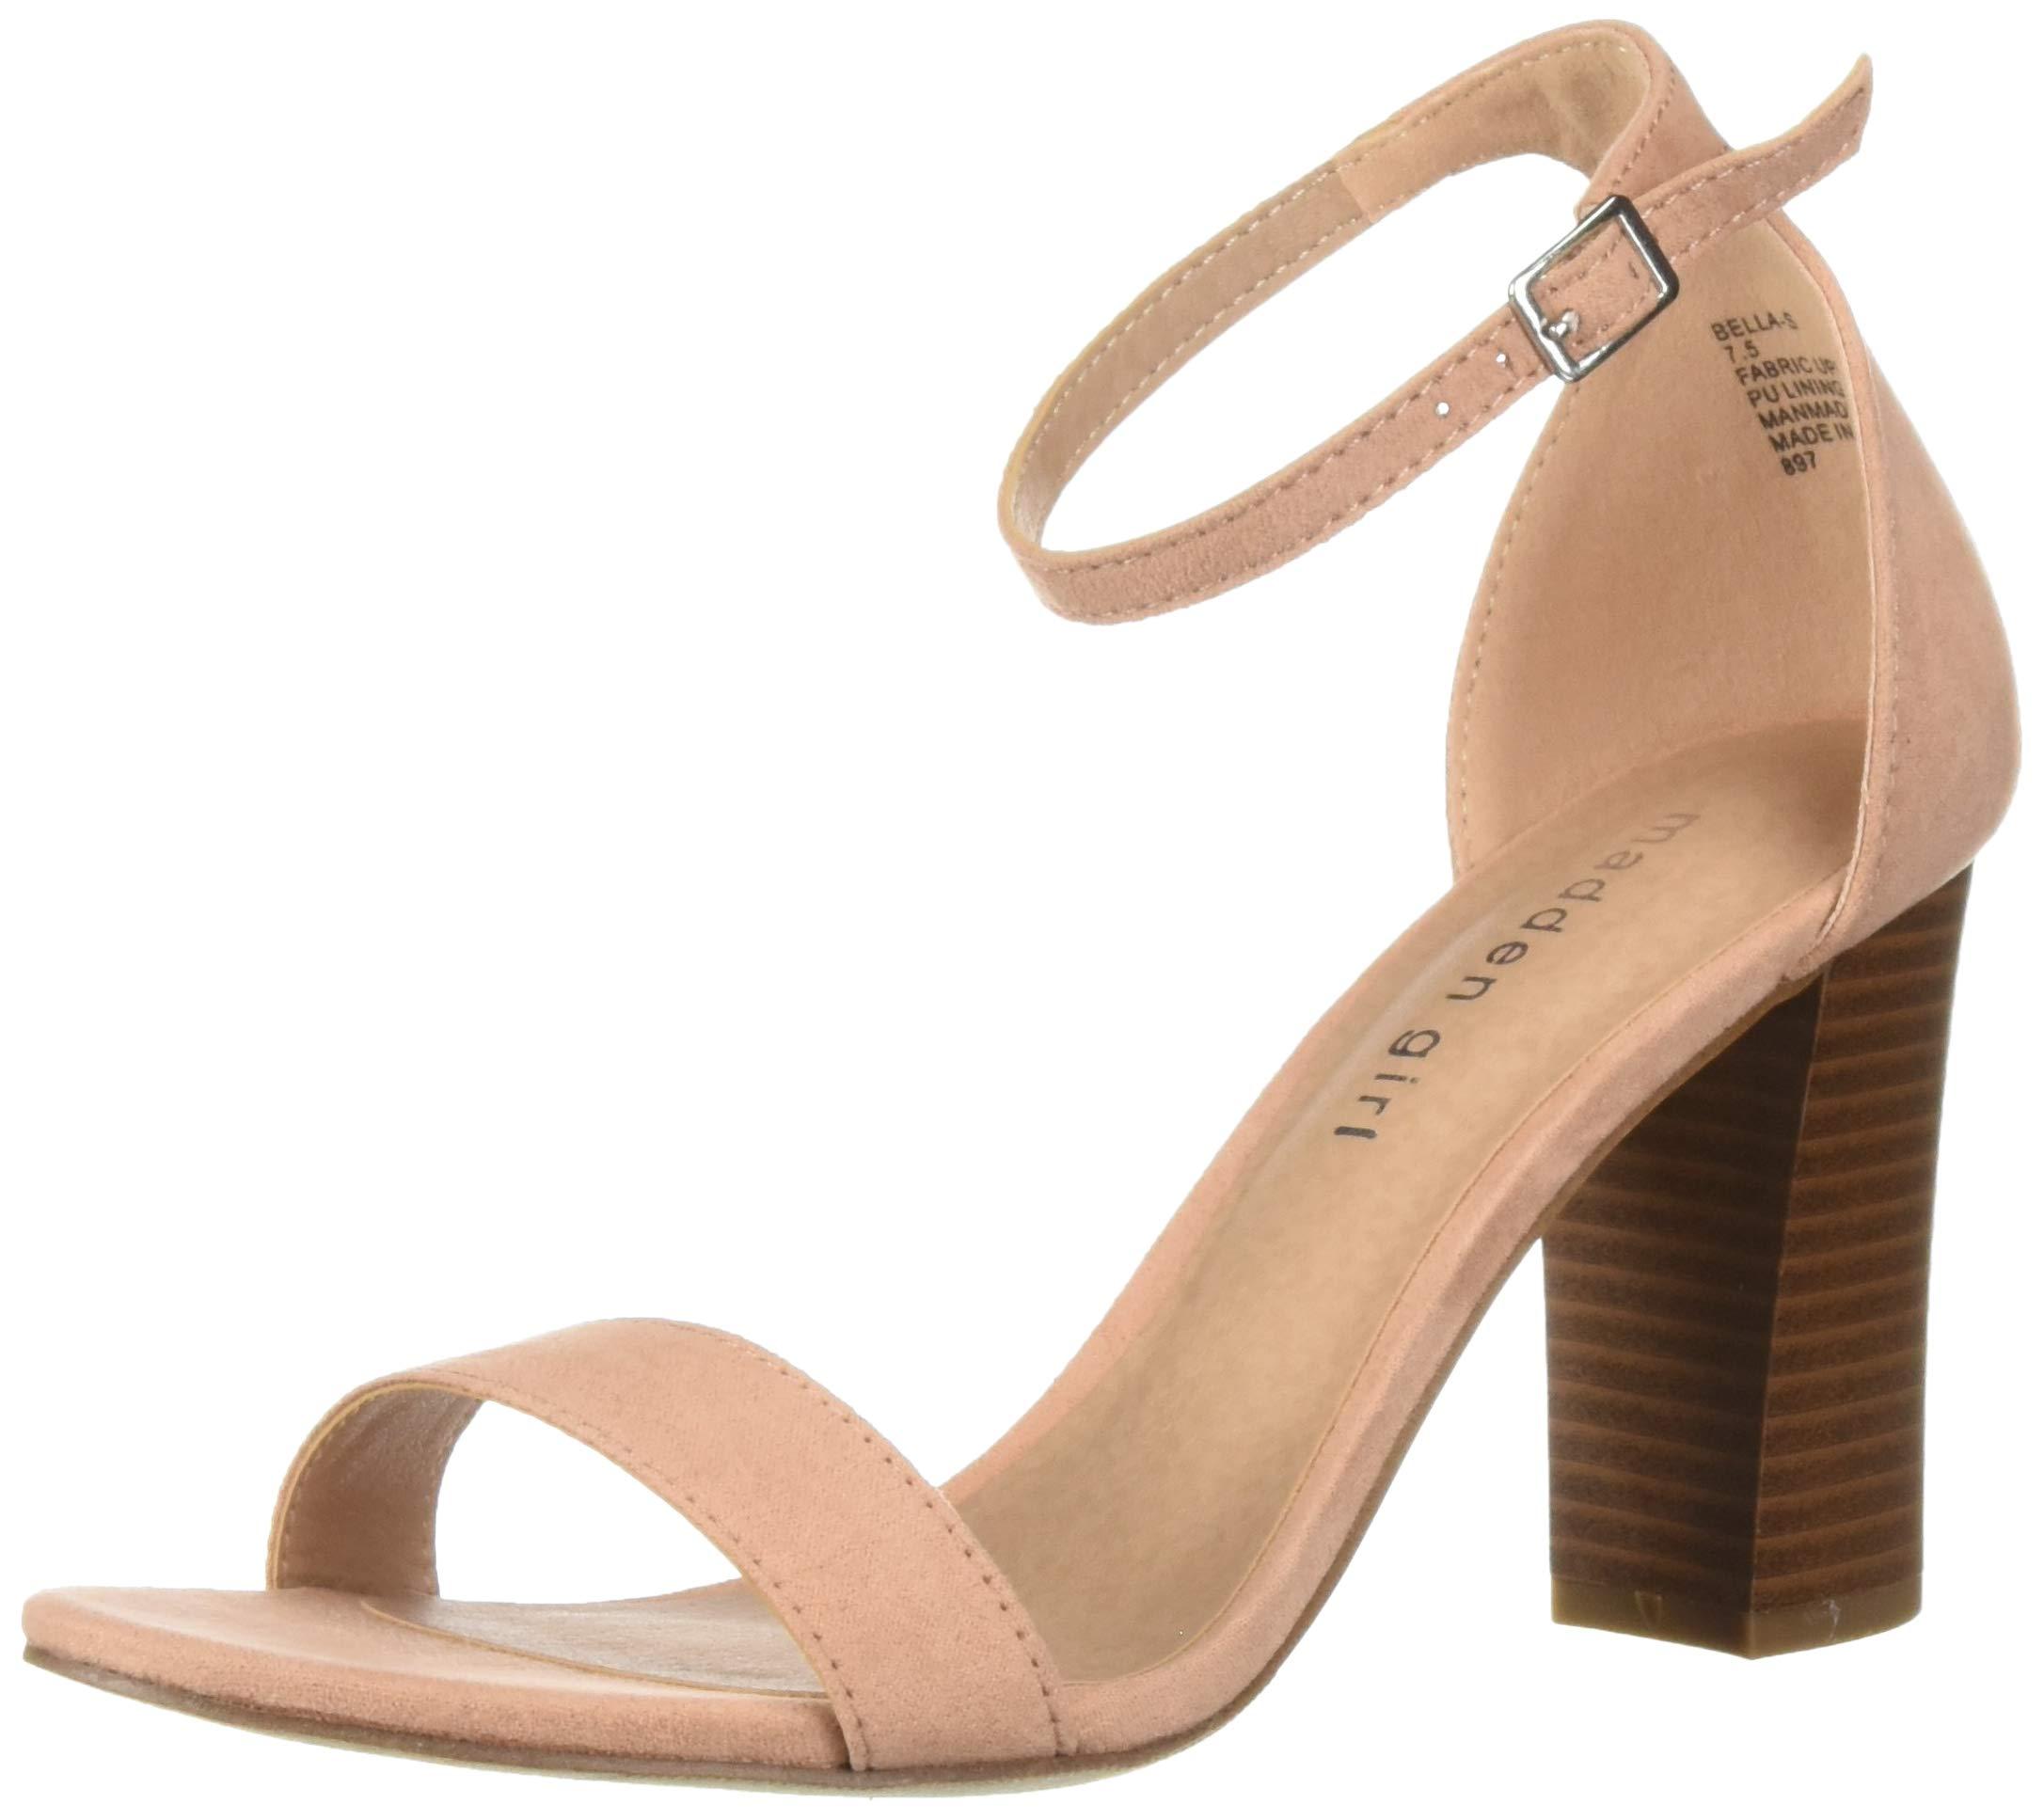 817e35e2c1631 Madden Girl Women's BEELLA Heeled Sandal, Champagne Fabric, 6 M US